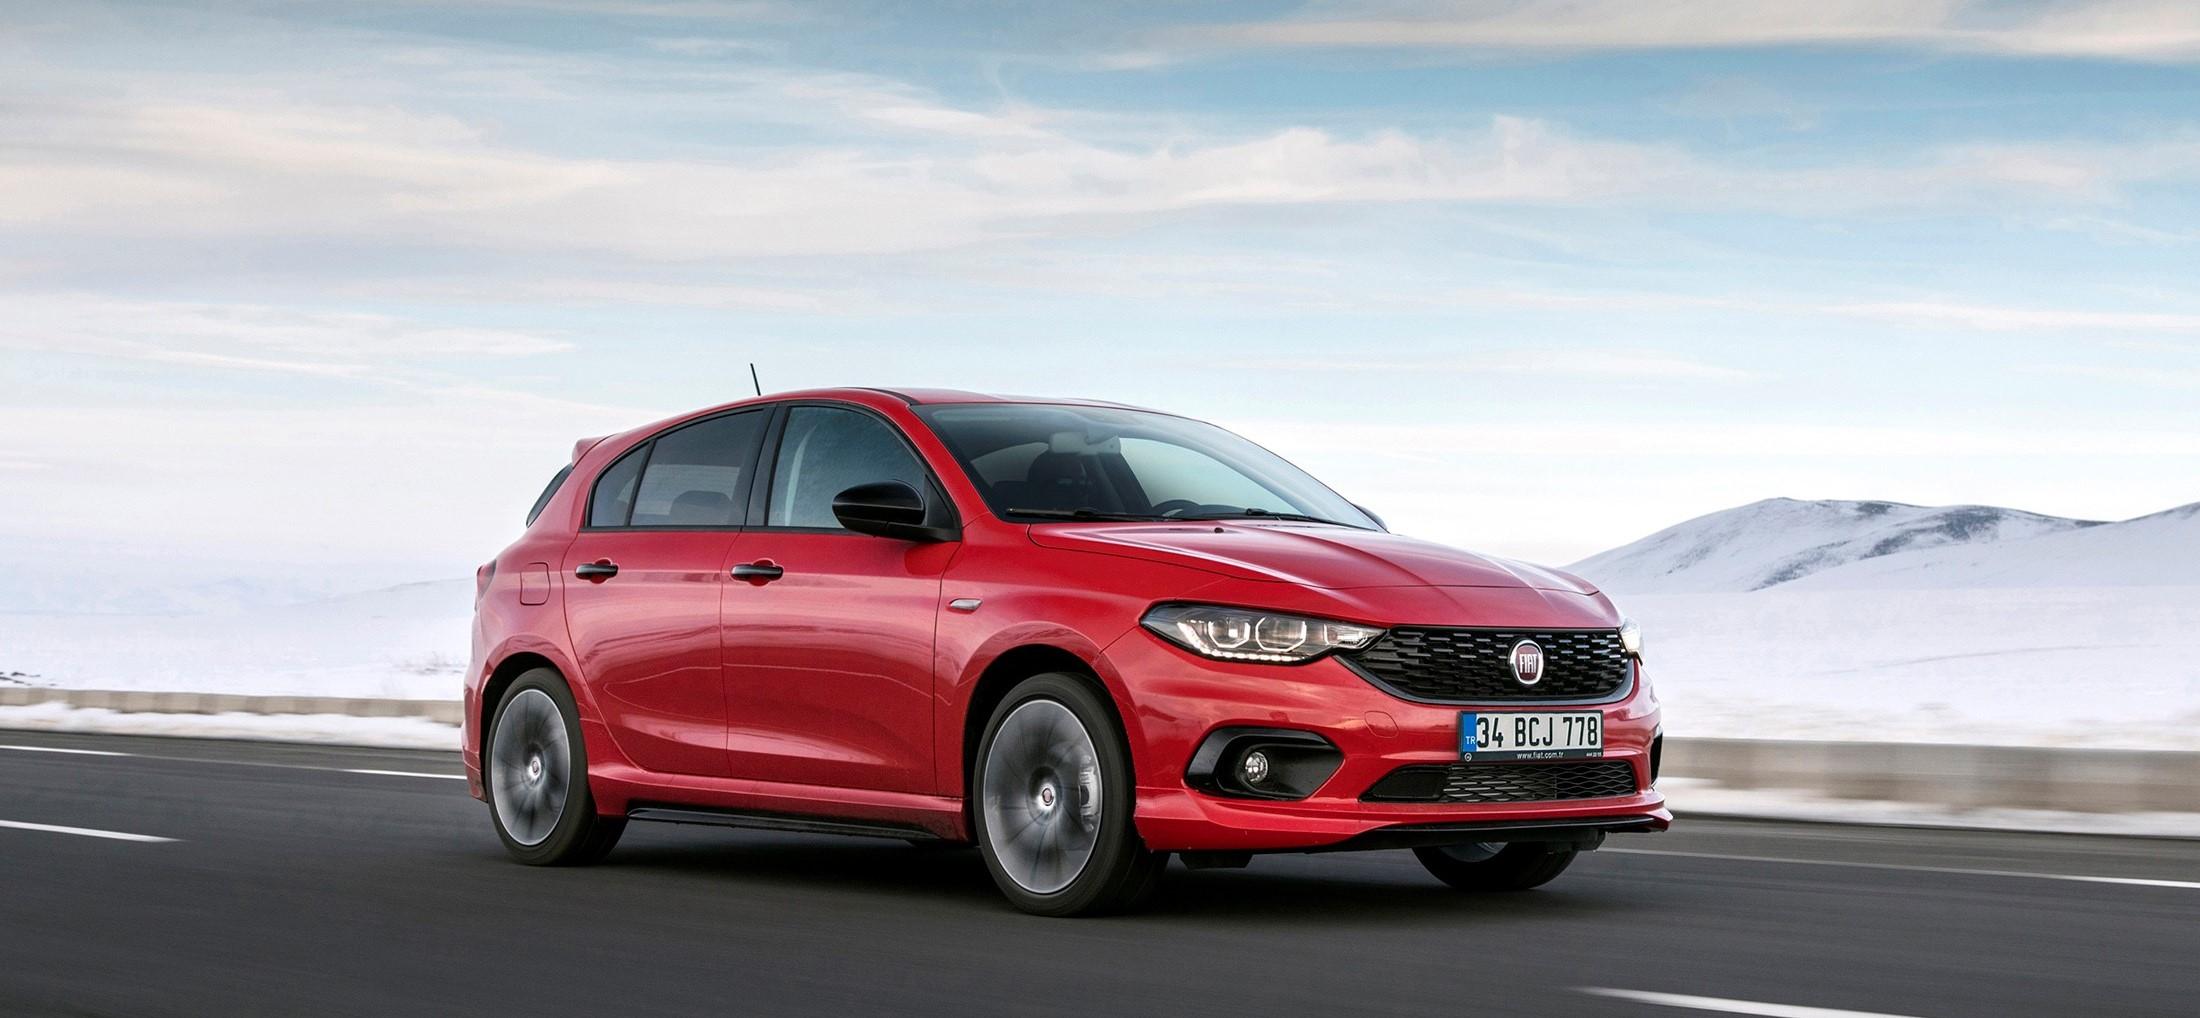 Fiat'tan Yılın Son Kampanyası